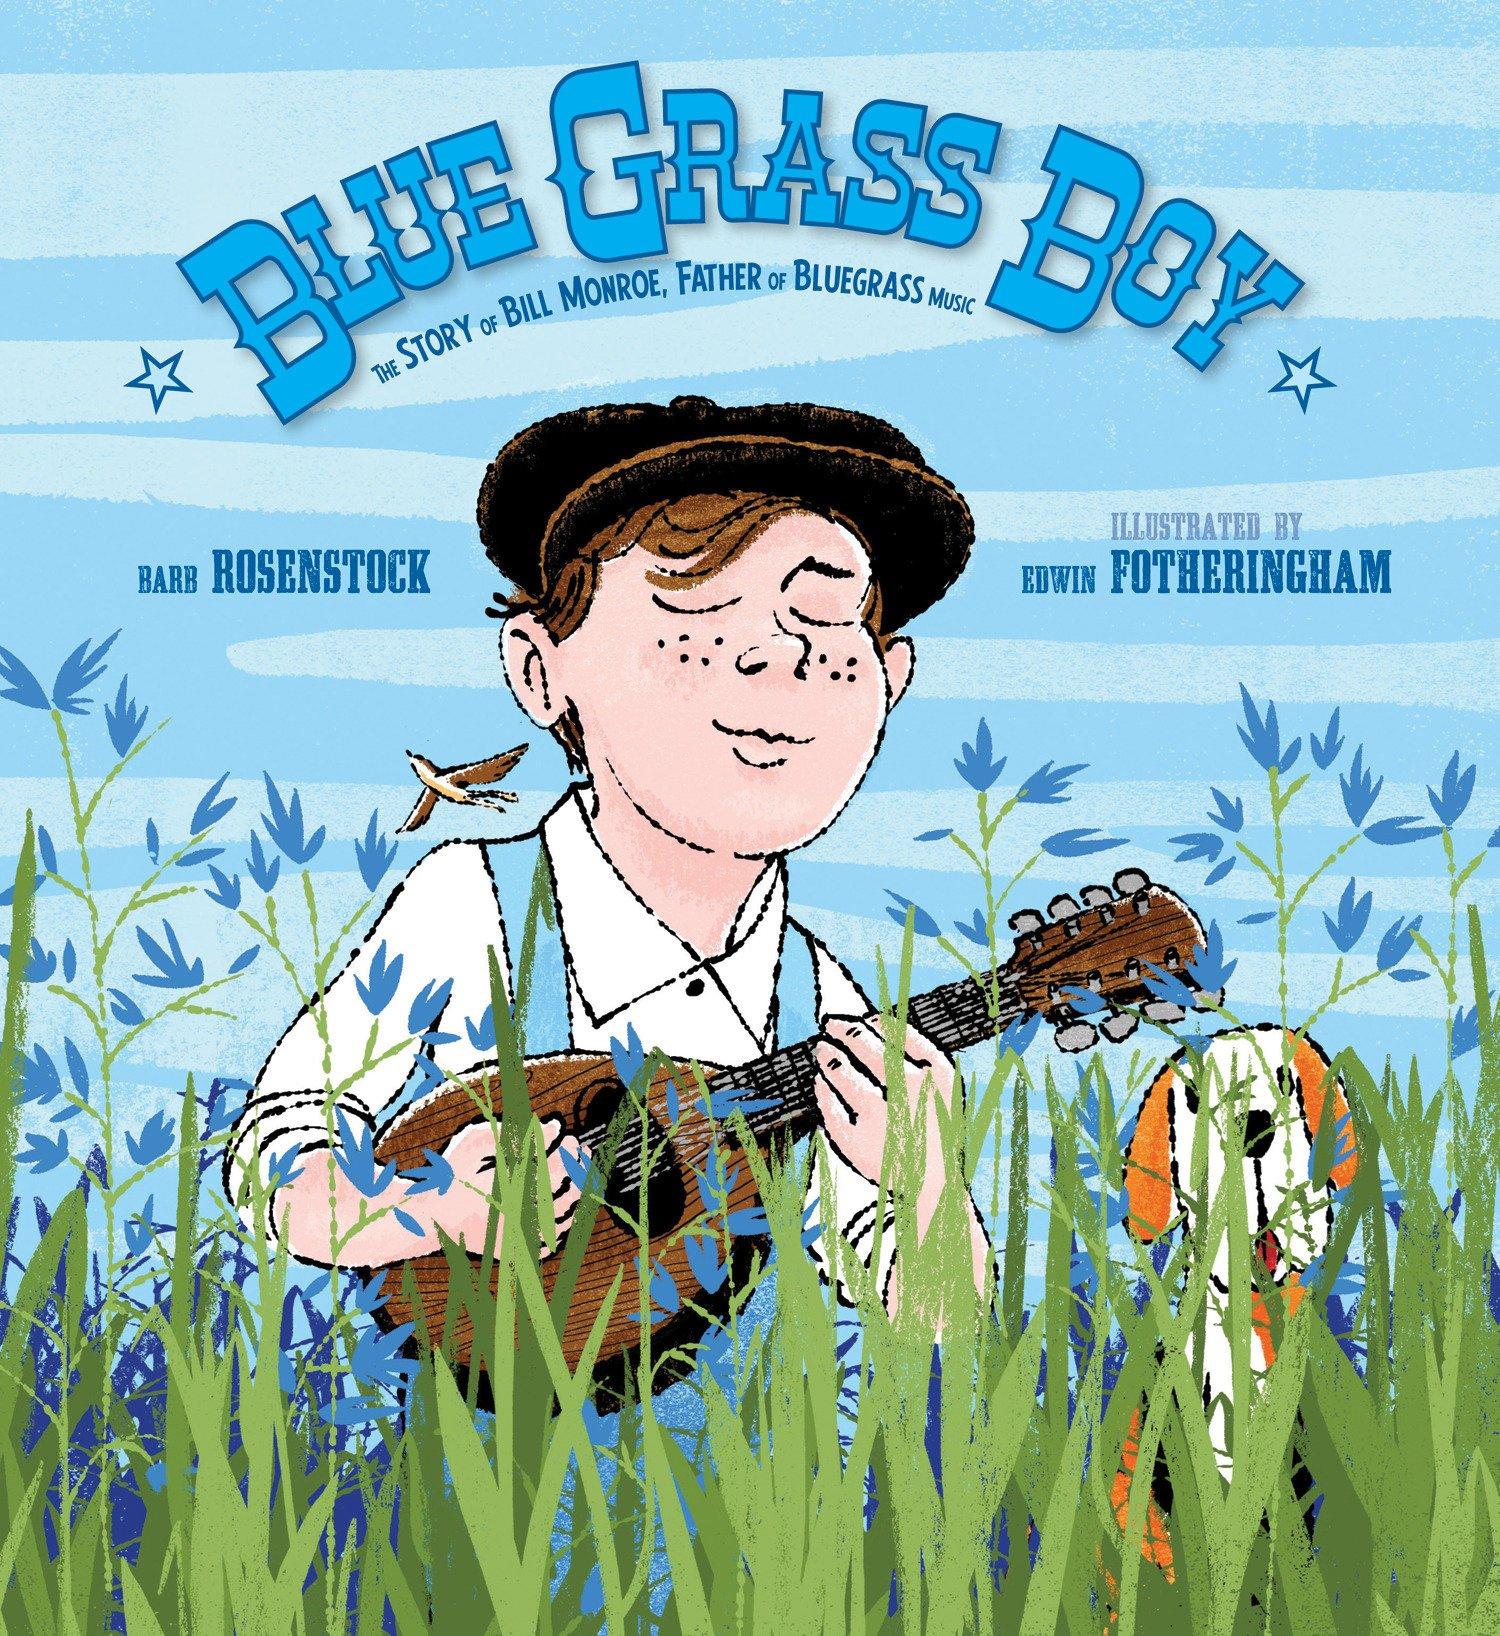 Amazon.com: Blue Grass Boy: The Story of Bill Monroe, Father of Bluegrass  Music (9781629794396): Rosenstock, Barb, Fotheringham, Edwin: Books